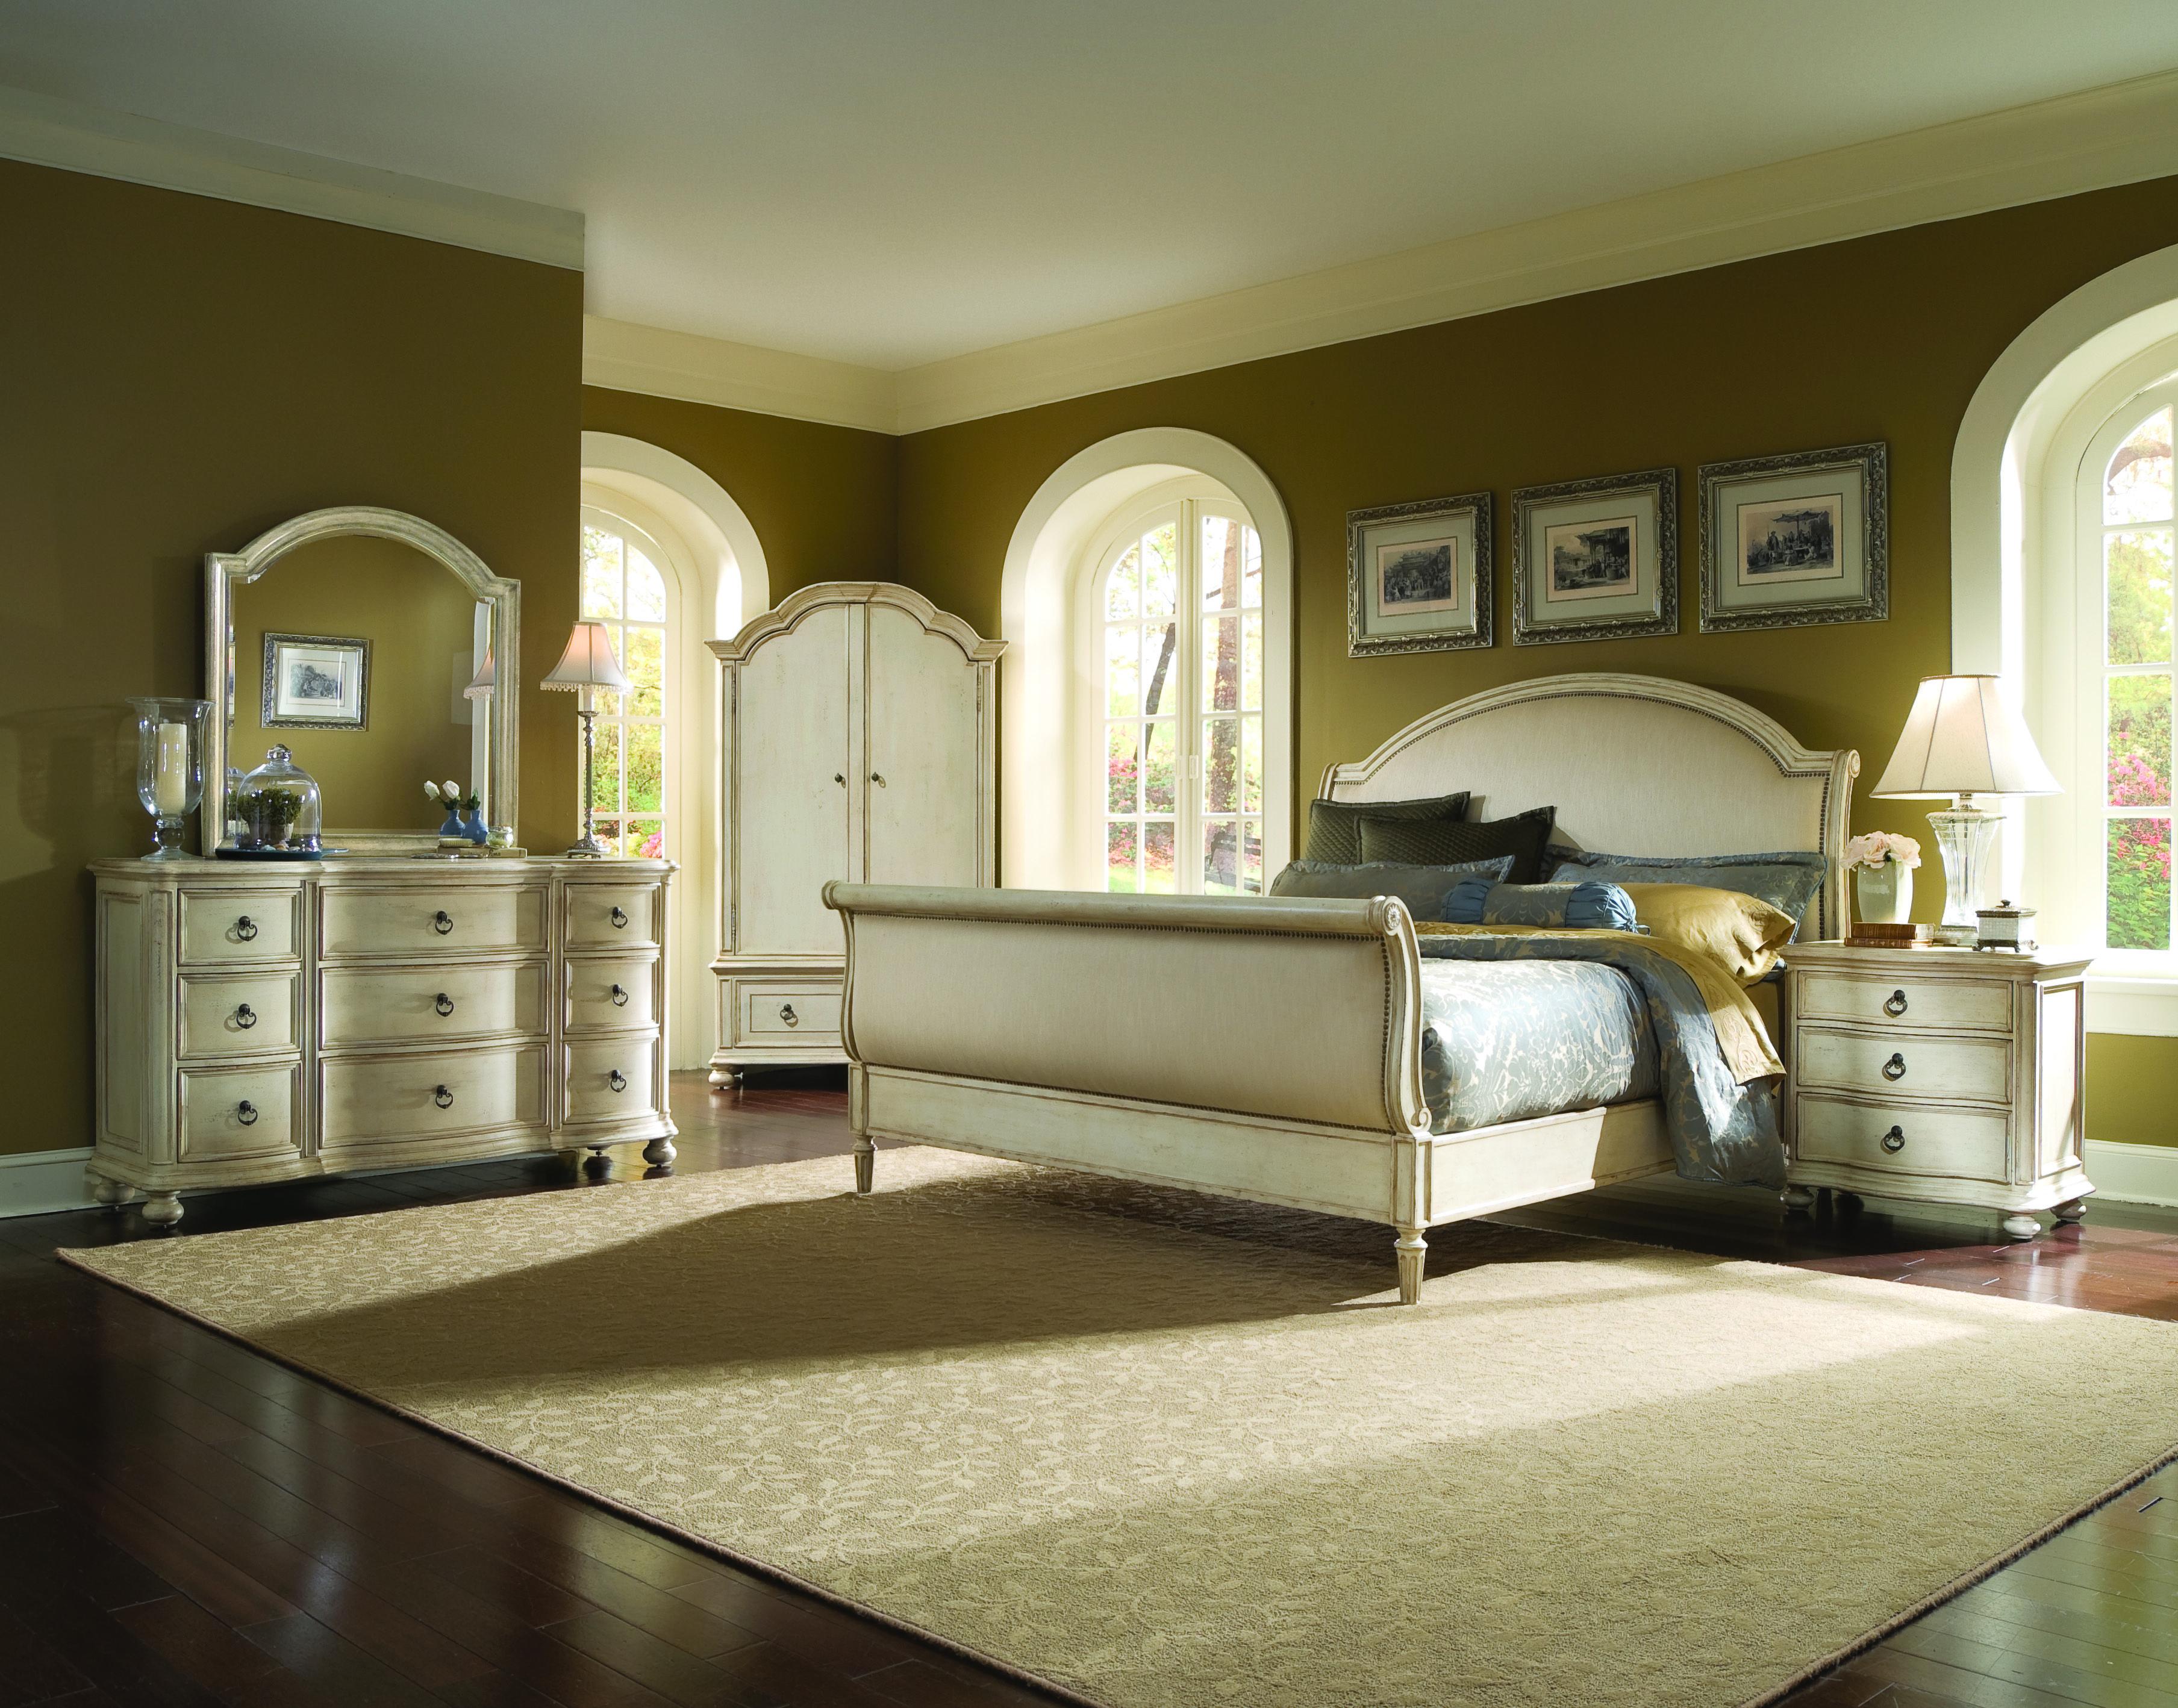 Provenance sleigh bed with wardrobe set triple dresser with bun